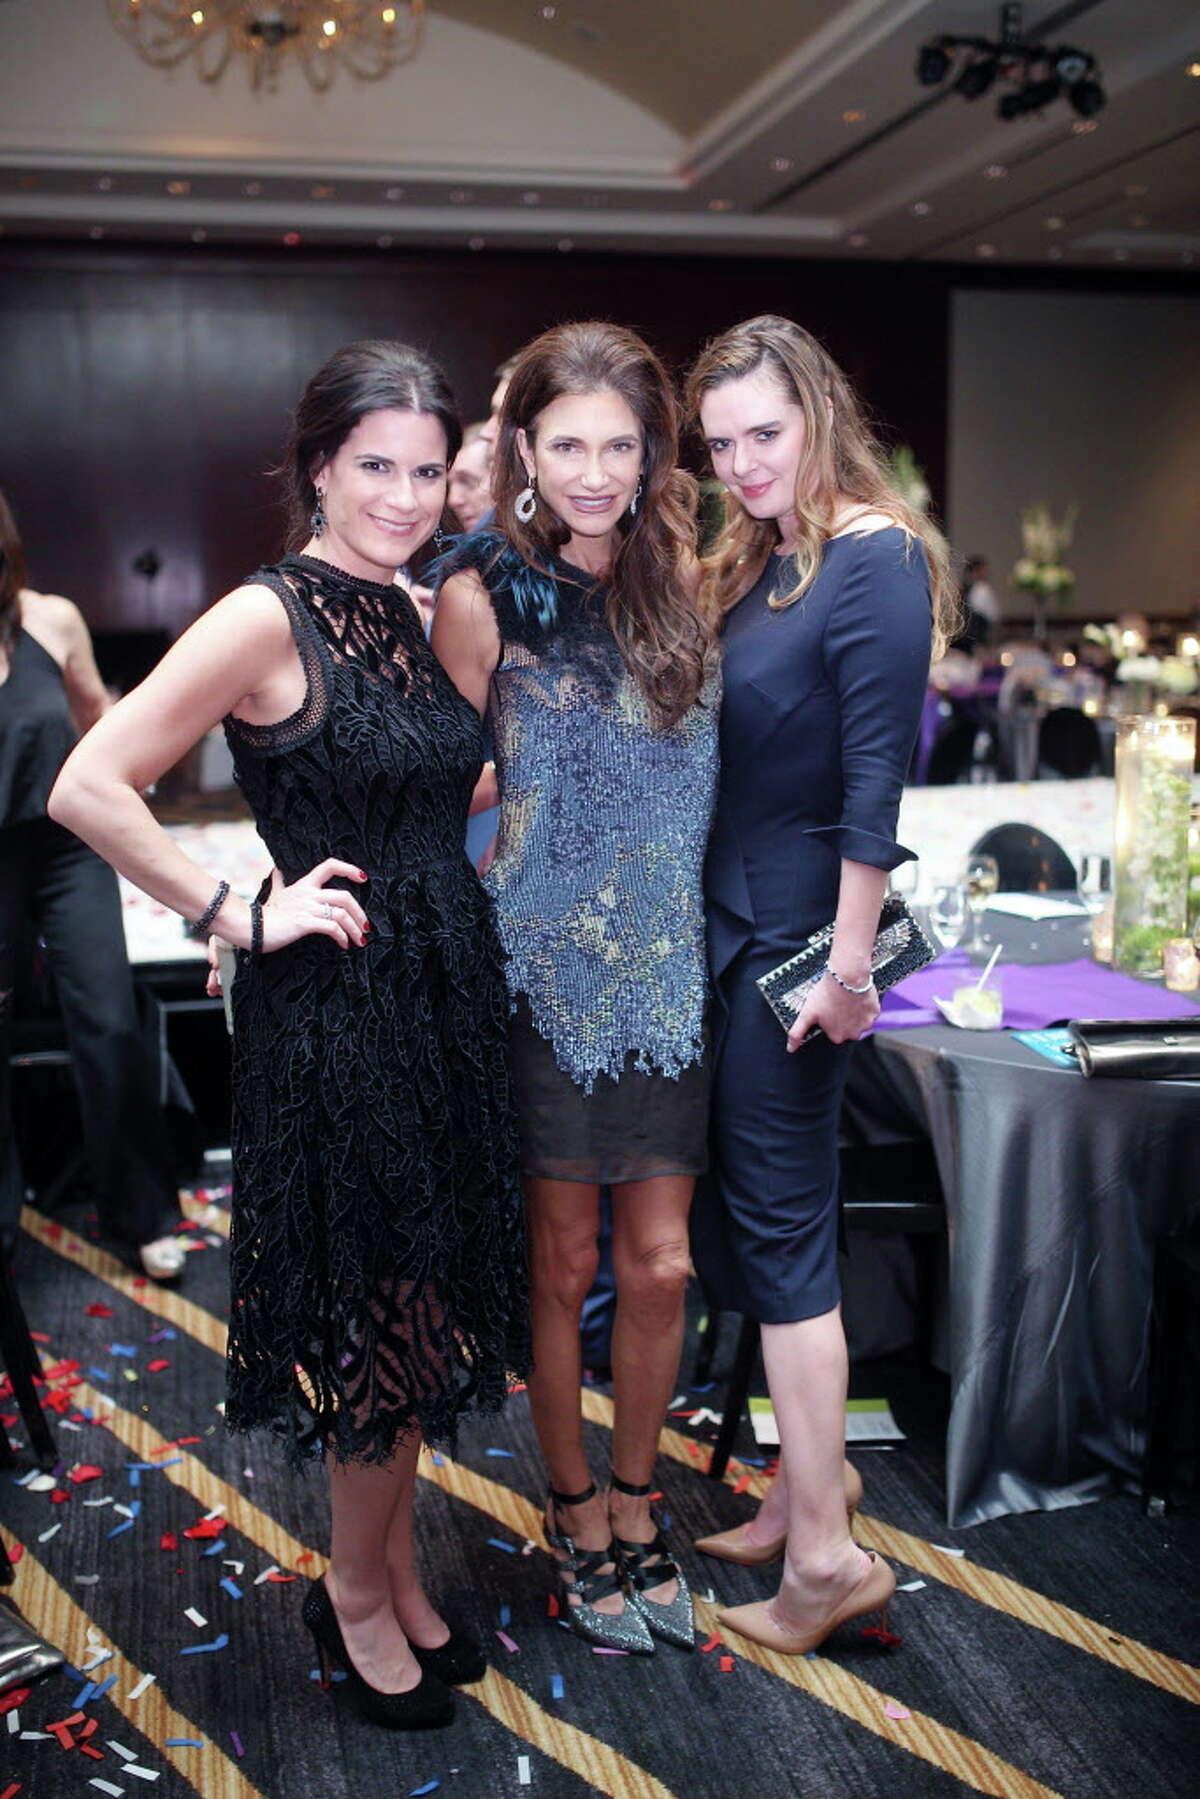 Katarina Tehlirian, Melissa Mithoff, and Eloise Frischkorn at Una Notte in Italia 2017